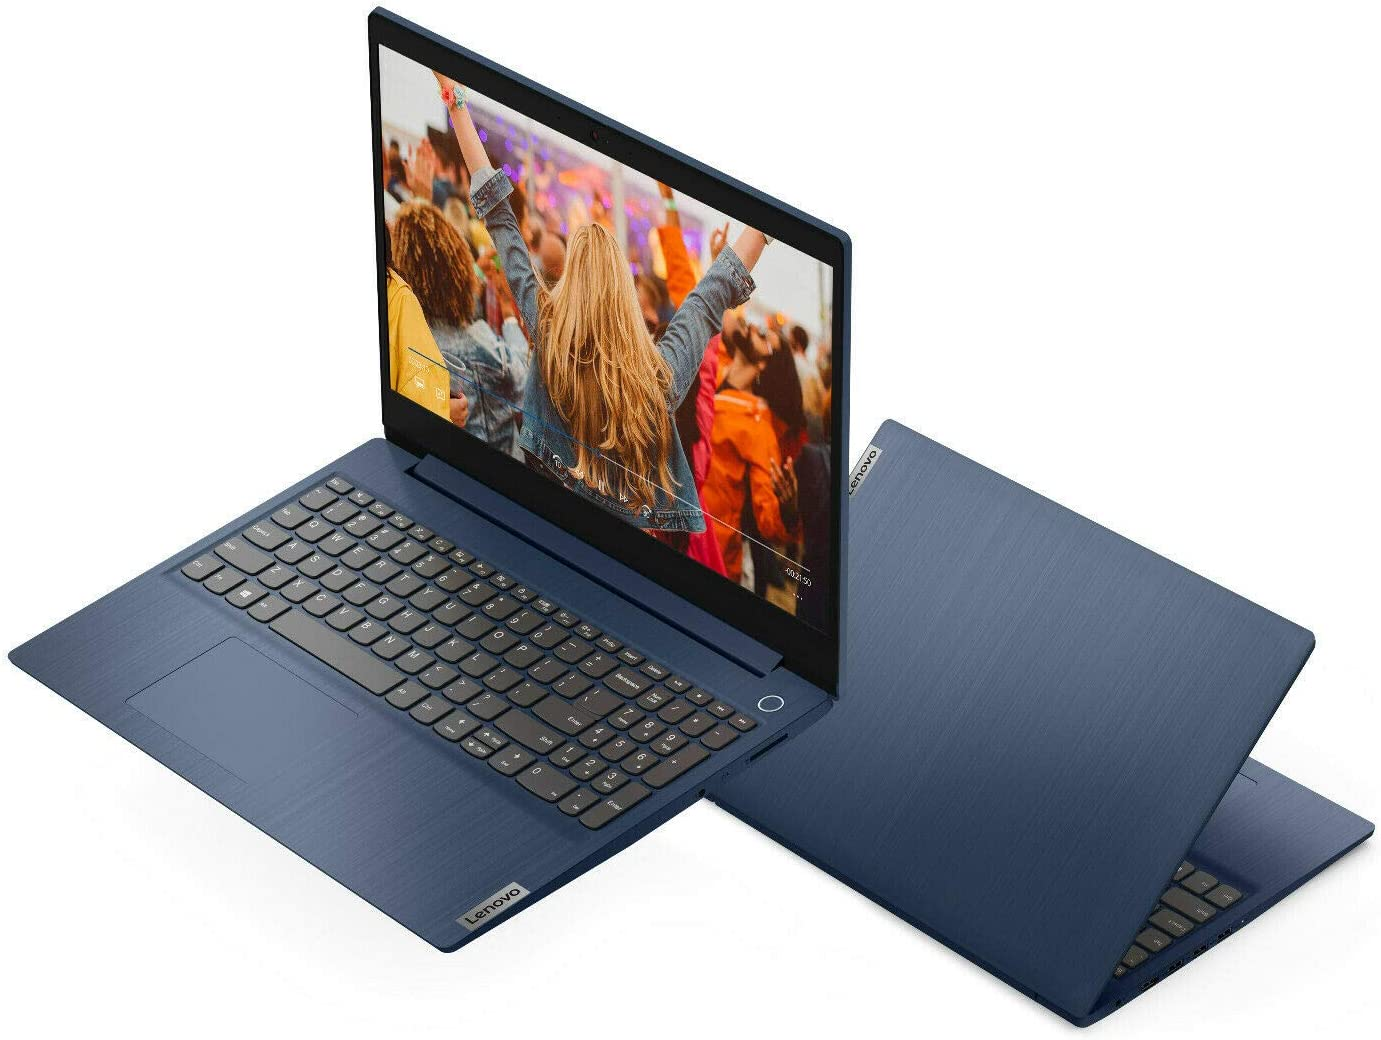 "Amazon.com: Lenovo IdeaPad 3 15.6"" Laptop, FHD (1920 x 1080) Display,  81W4000AUS AMD Ryzen 5 4500U Processor, 8GB DDR4 RAM, 1TB Hard Drive, AMD  Radeon Vega 6 Graphics, Narrow Bezel, Windows 10,"